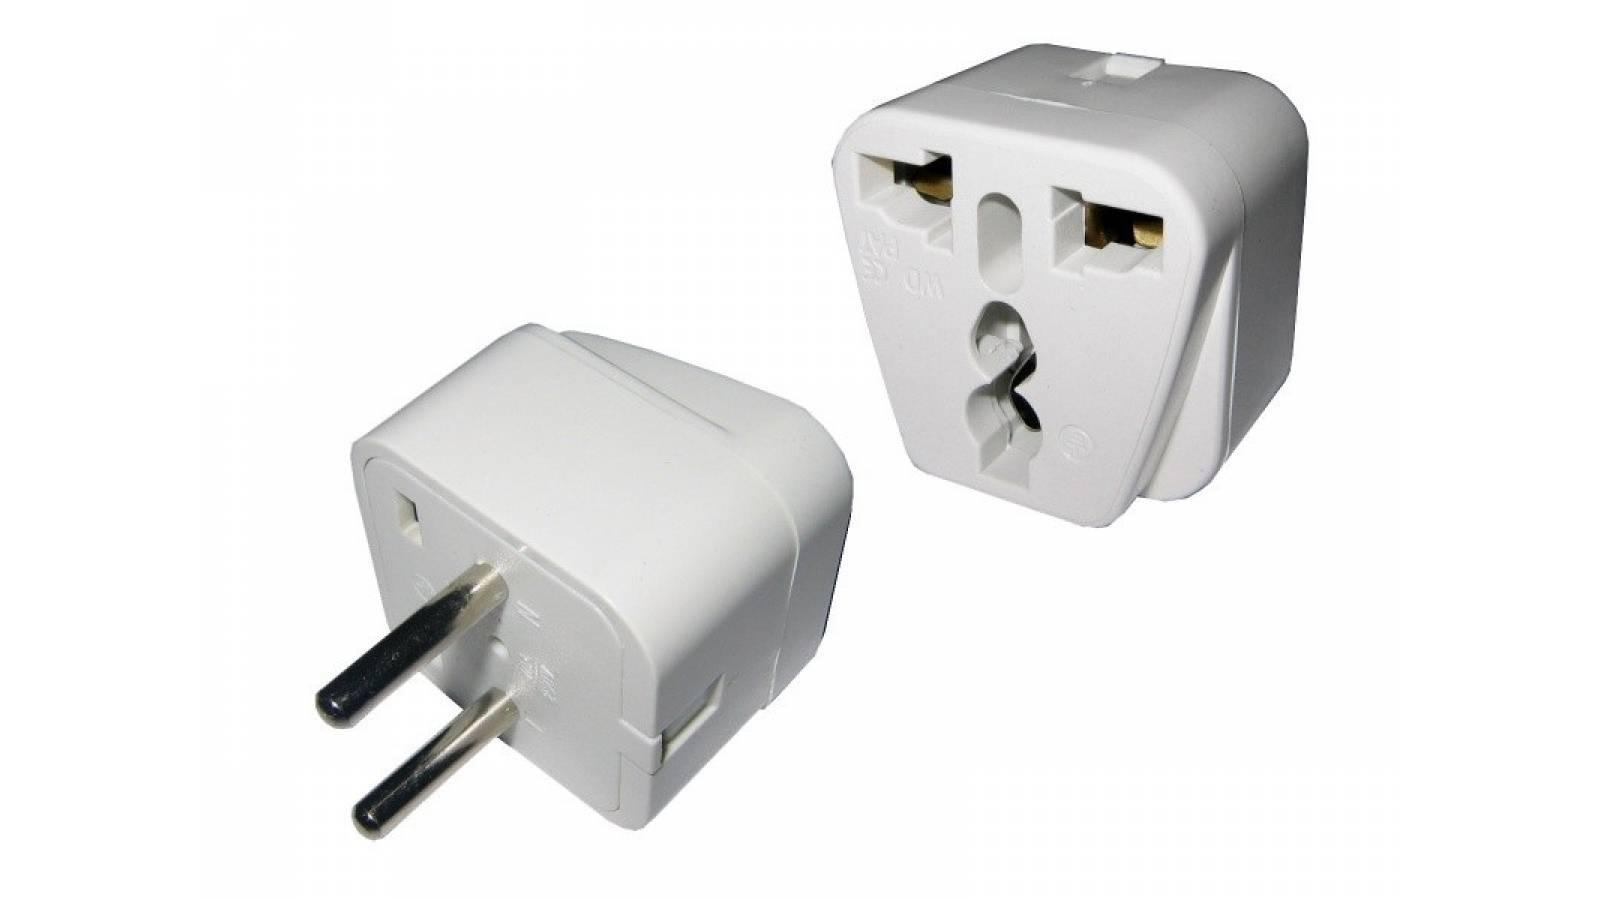 Adaptador de corriente universal a 2 en linea